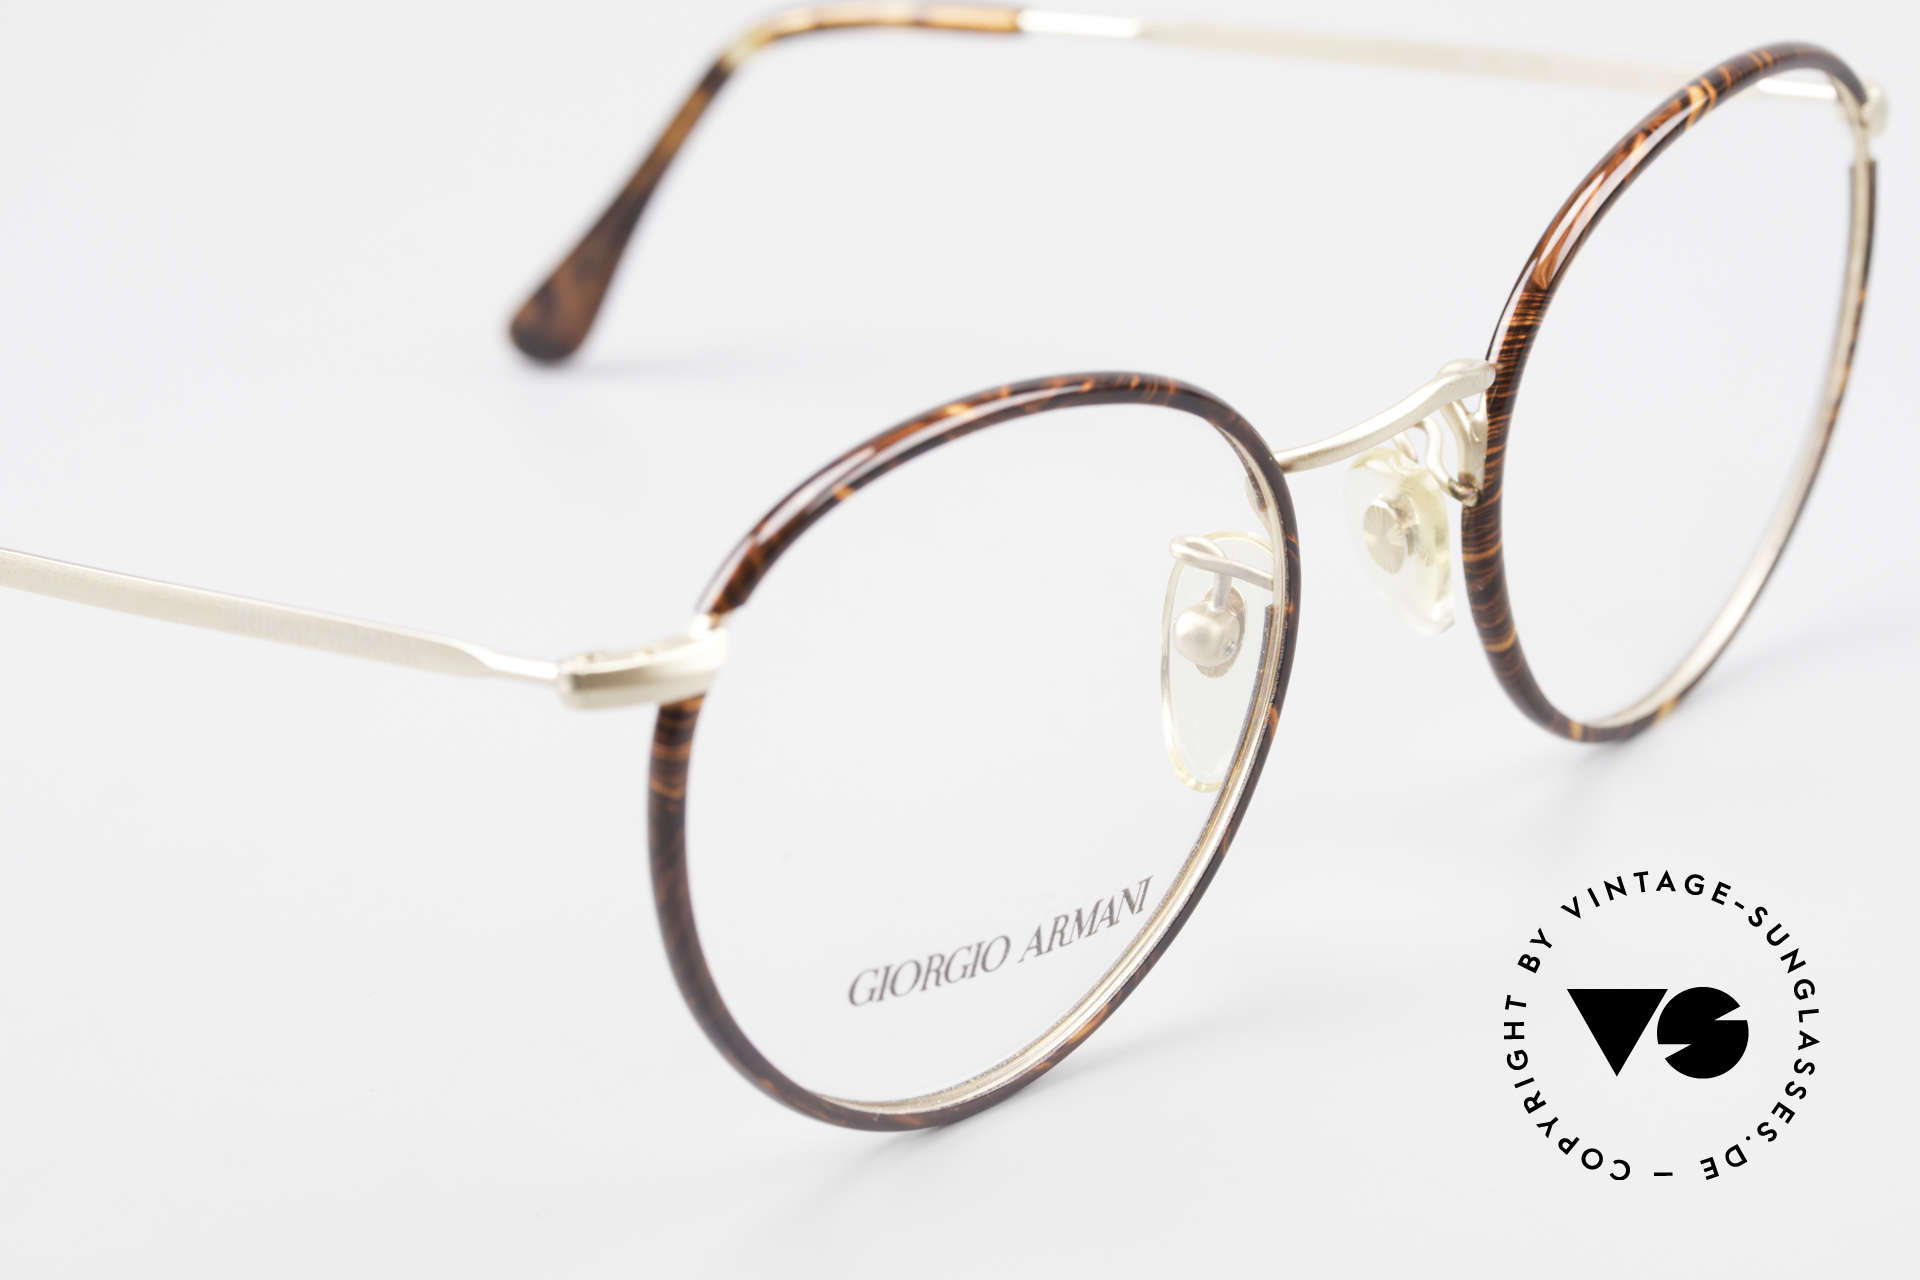 Giorgio Armani 112 90's Panto Eyeglasses Men, unworn 90's model in size 51/22 (130mm frame width), Made for Men